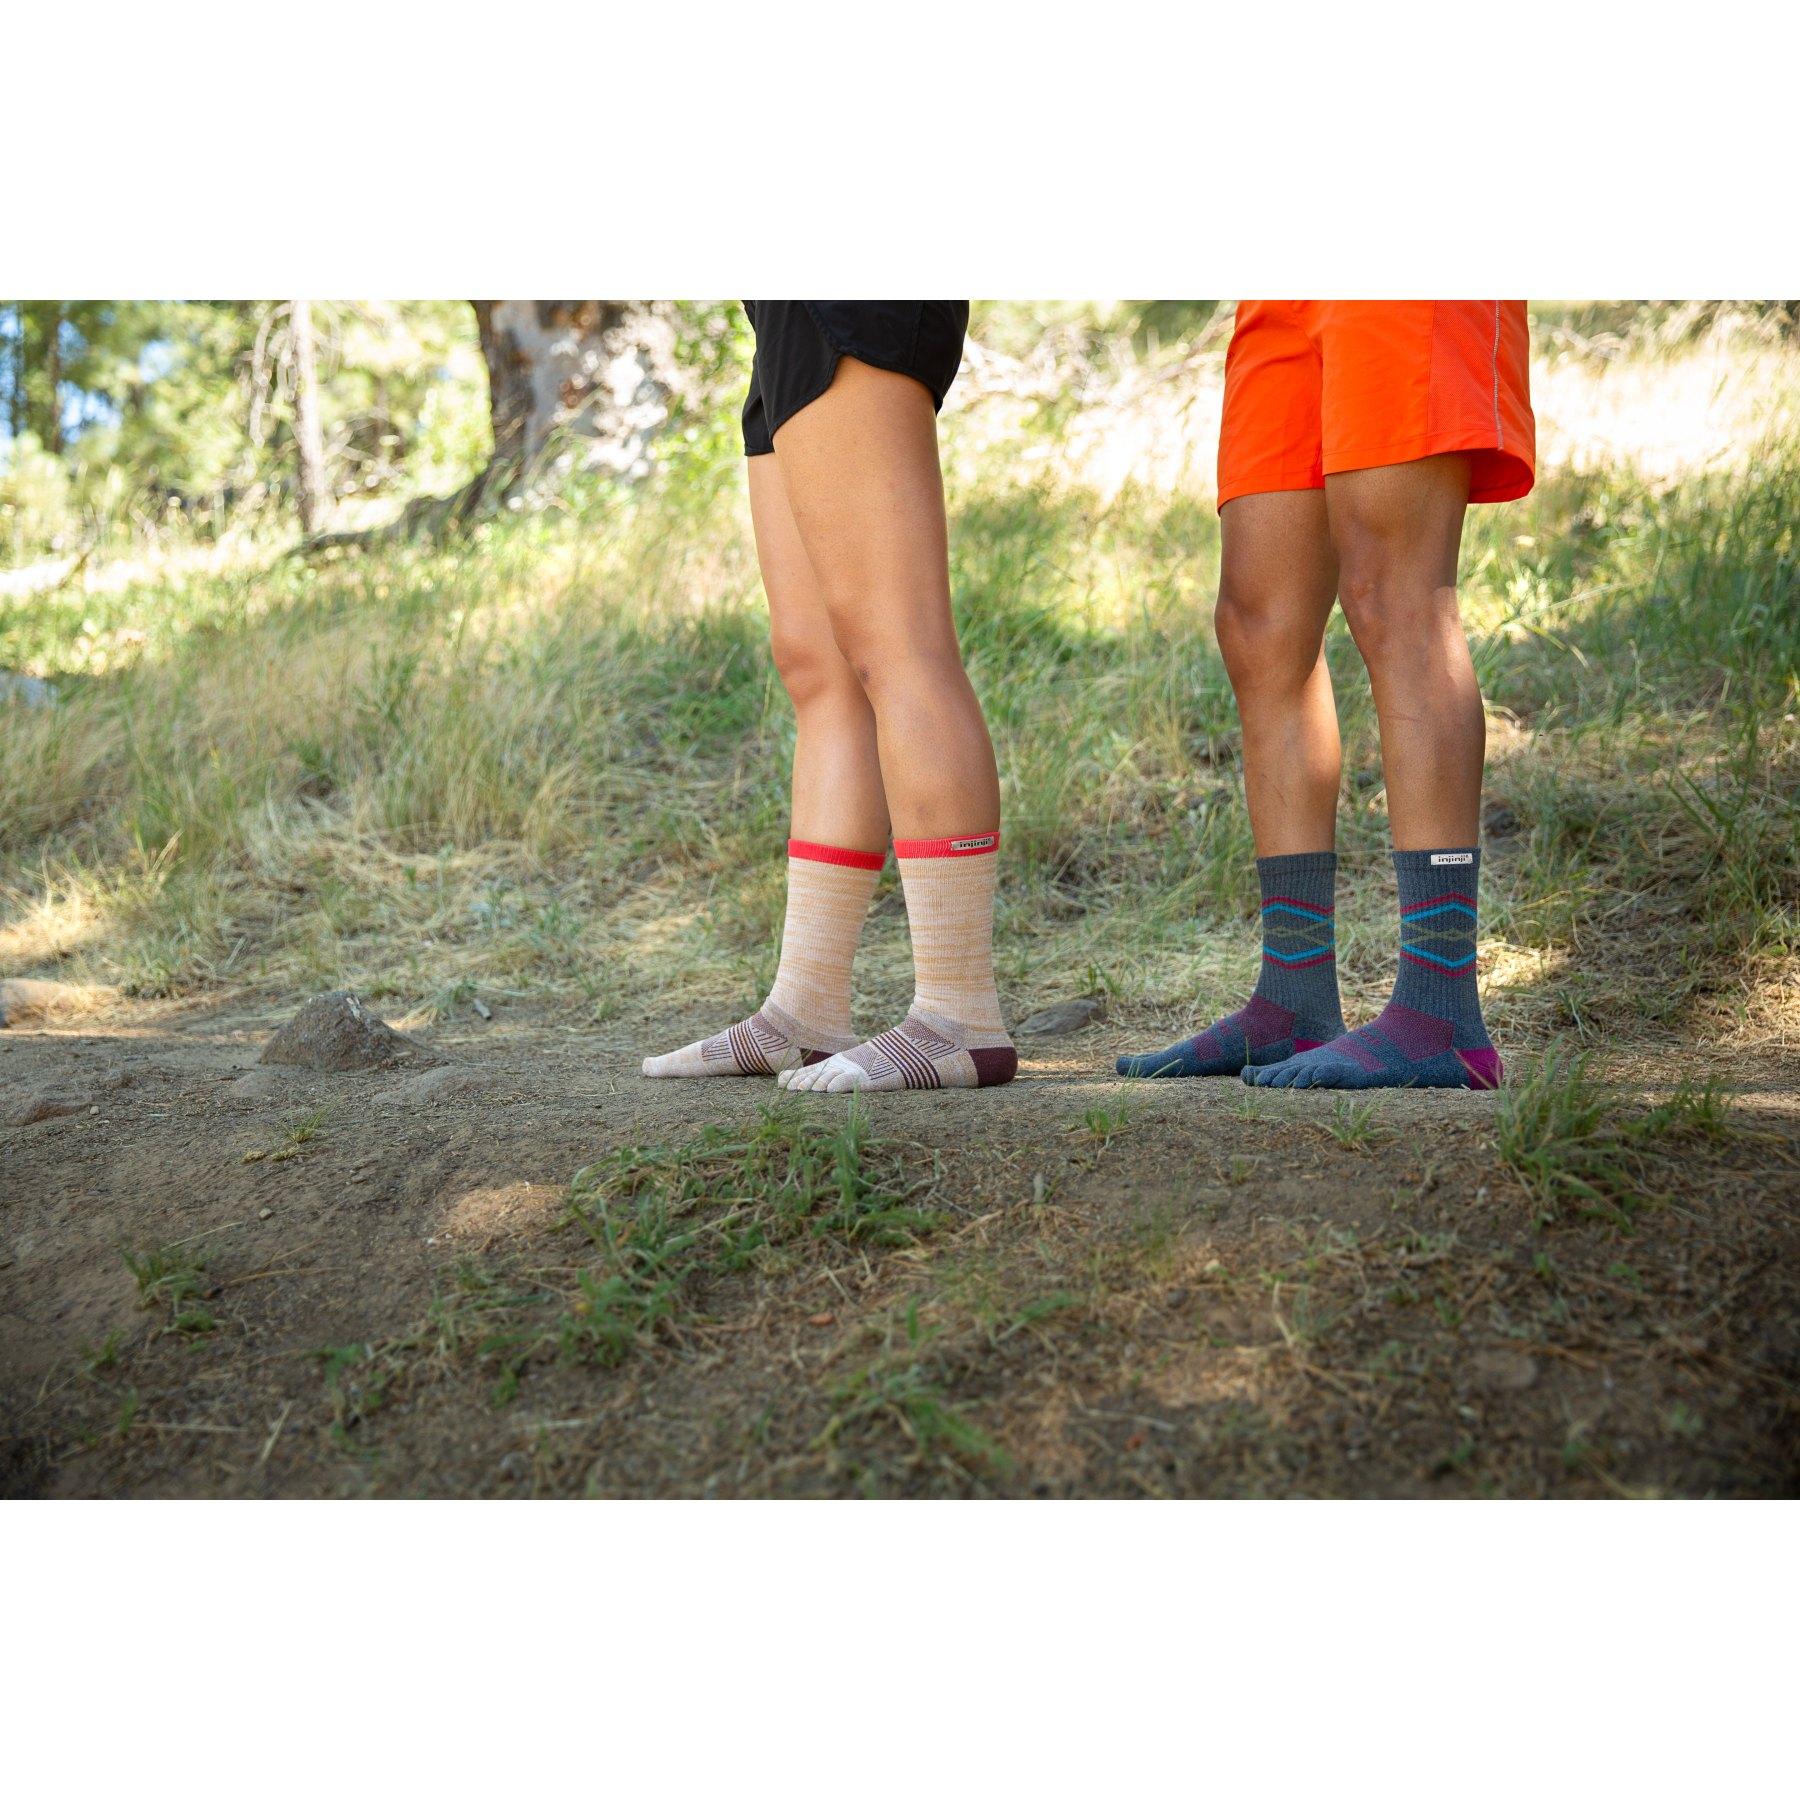 Bild von Injinji Women's Trail Midweight Crew Socks - Avalanche